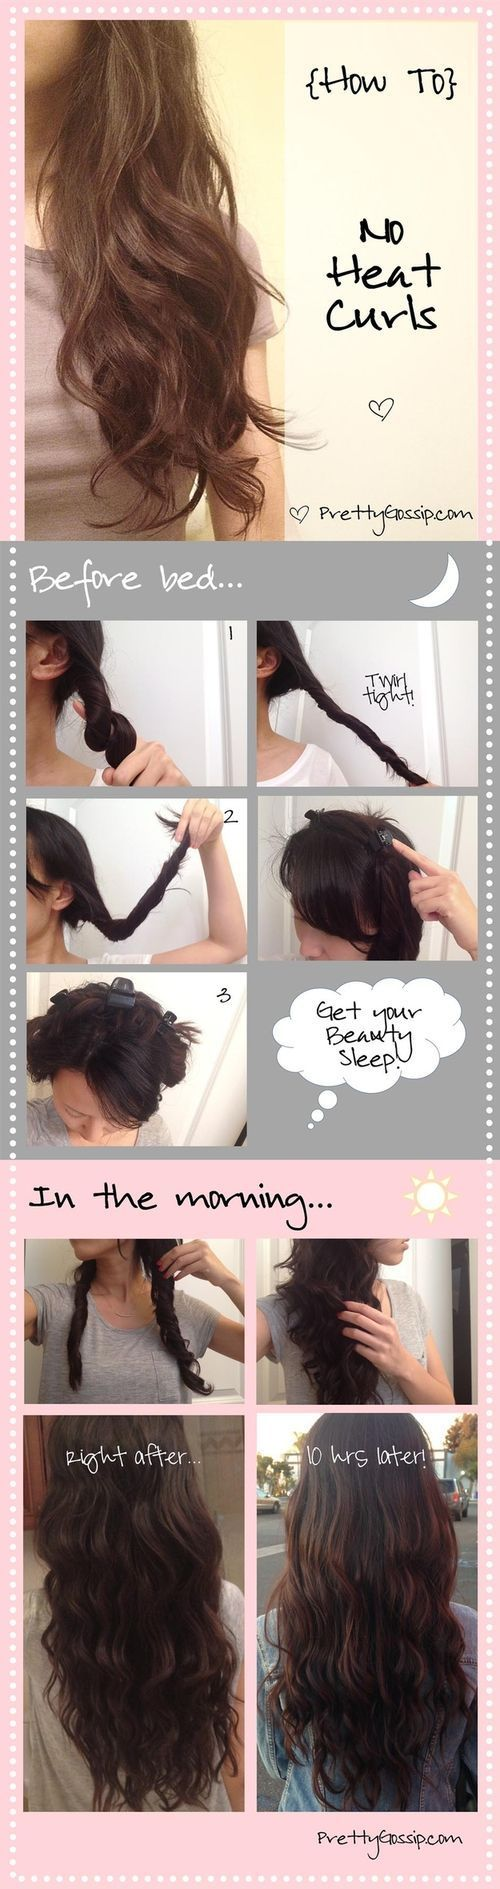 Tremendous 1000 Ideas About Wet Hair Overnight On Pinterest Curly Hair Short Hairstyles Gunalazisus